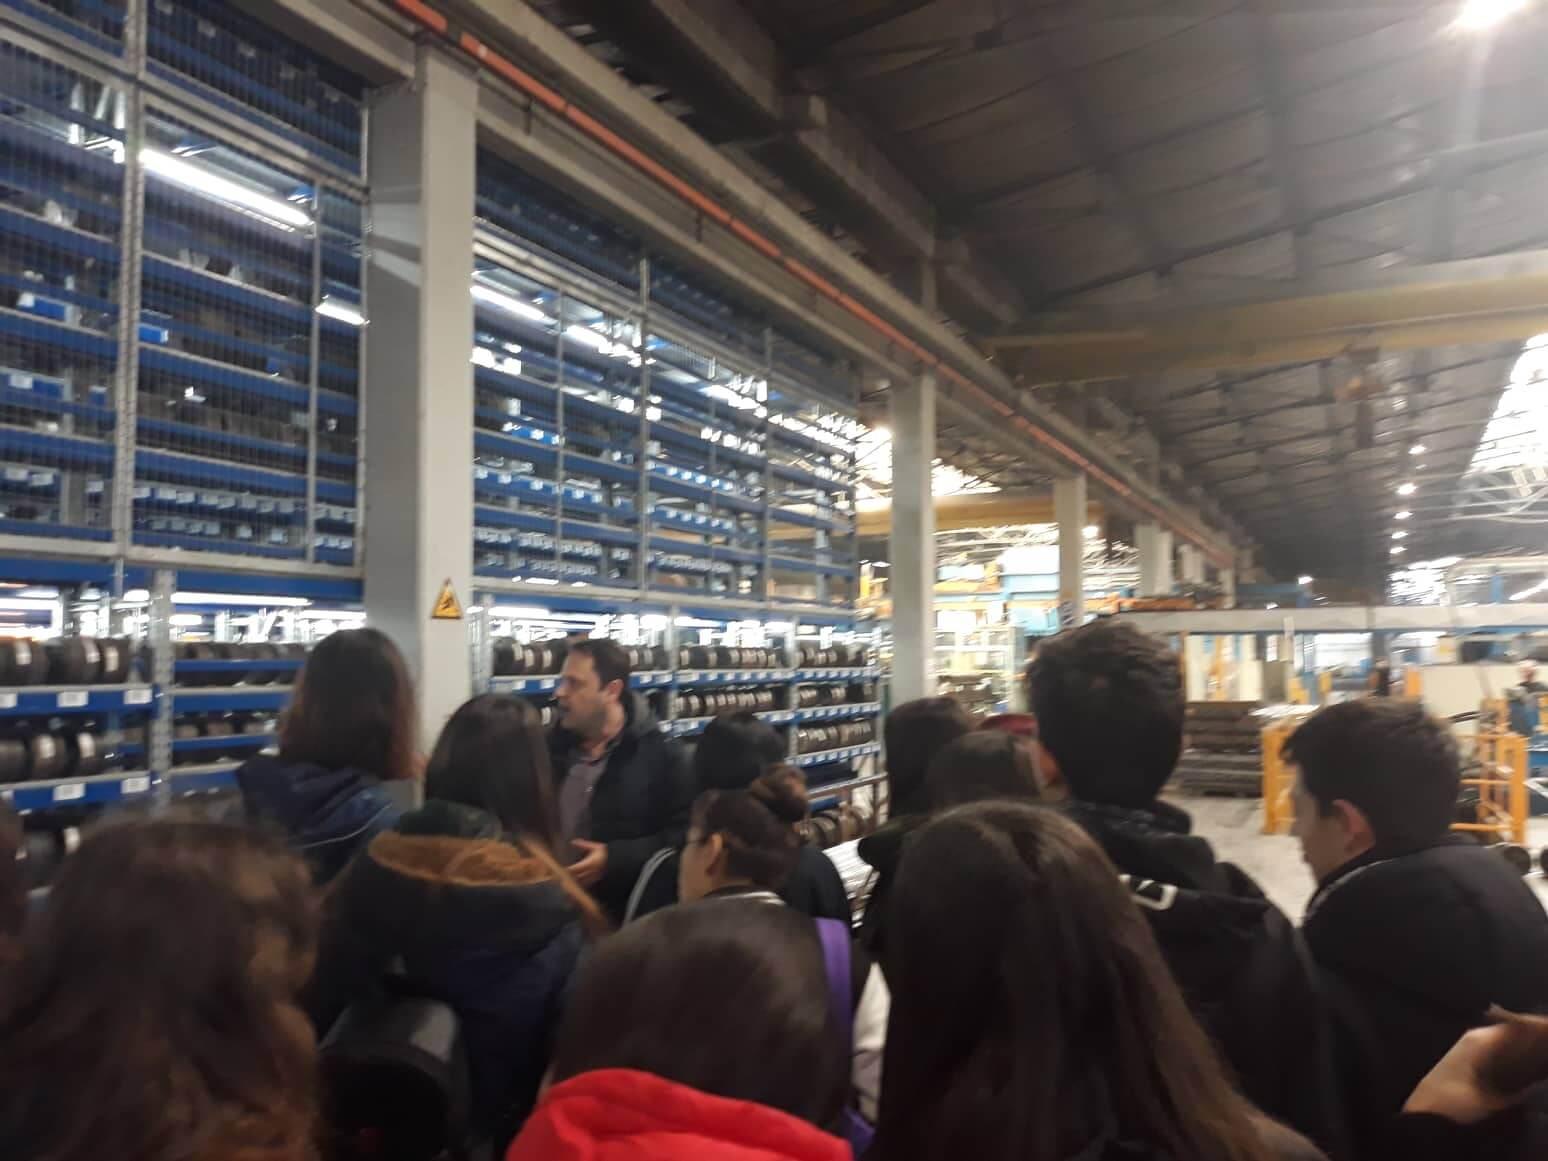 To Παραγωγικό Σκασιαρχείο επισκέπτεται την Alumil 2